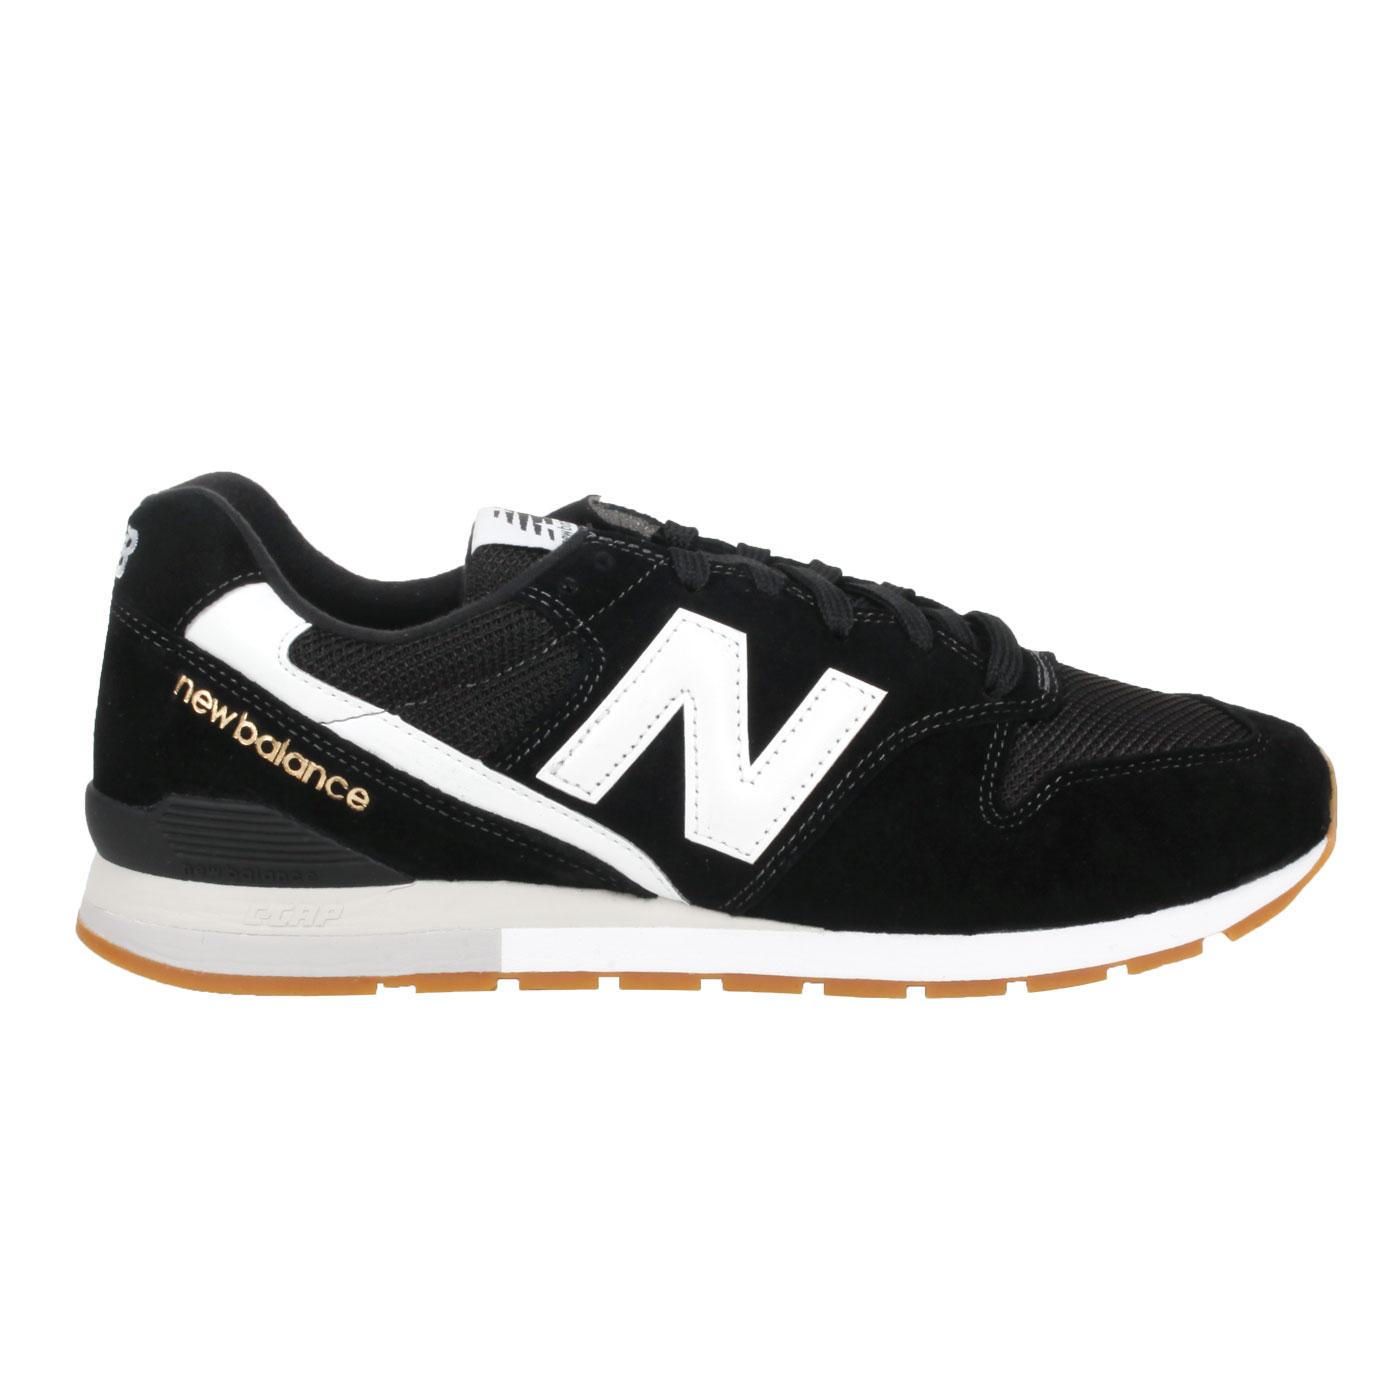 NEW BALANCE 男款休閒運動鞋 CM996CPG - 黑白